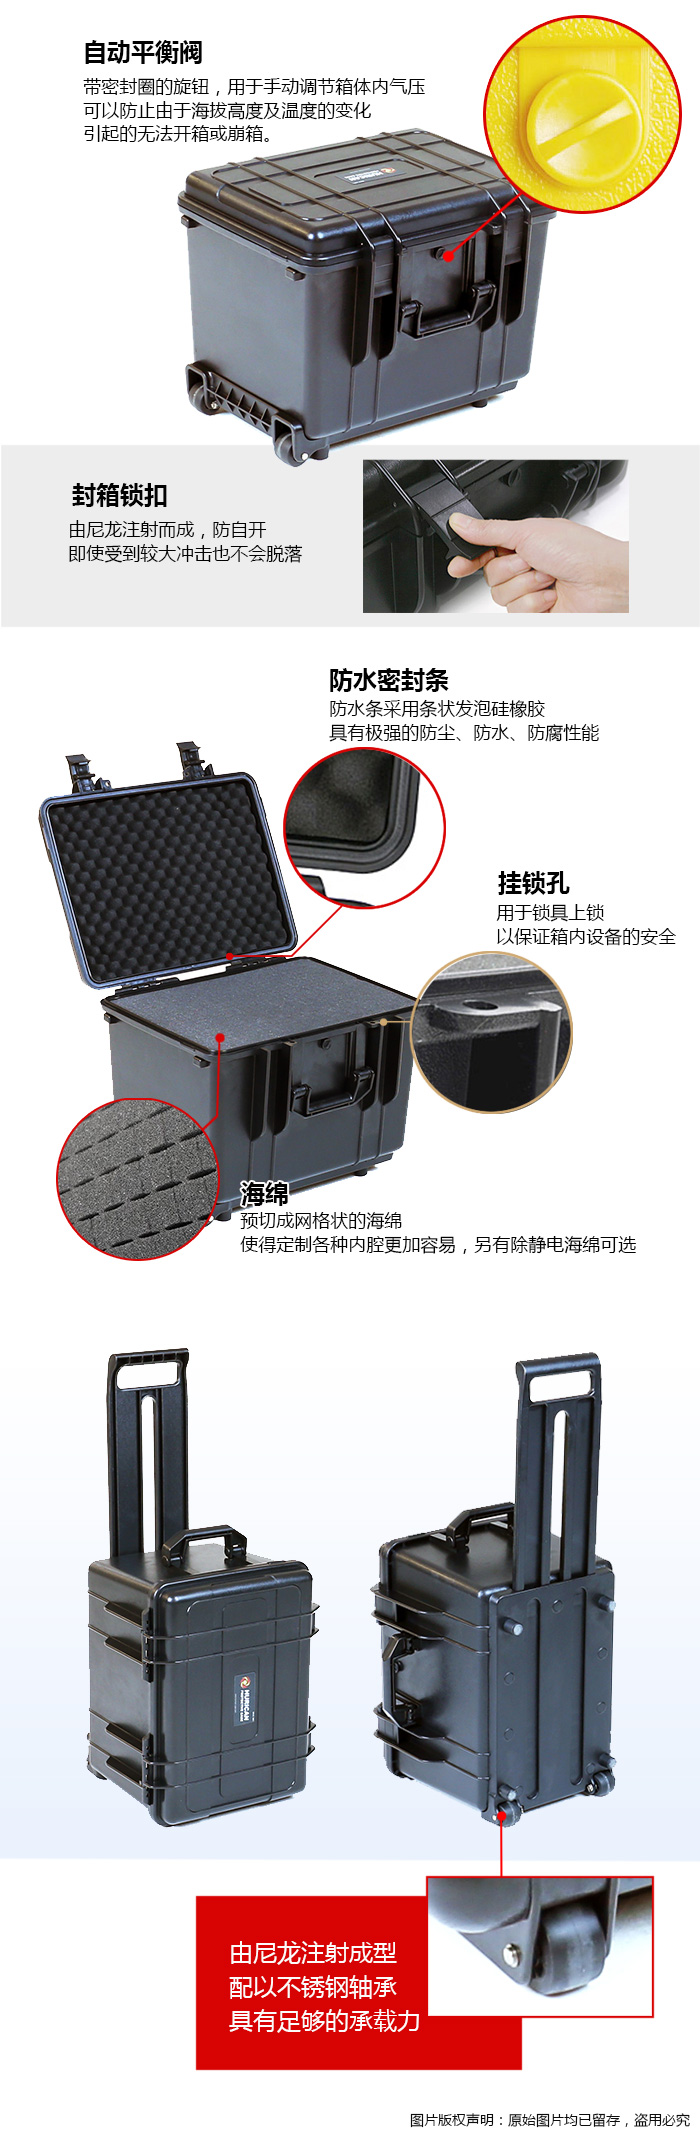 waterproof_cases_37-11-1